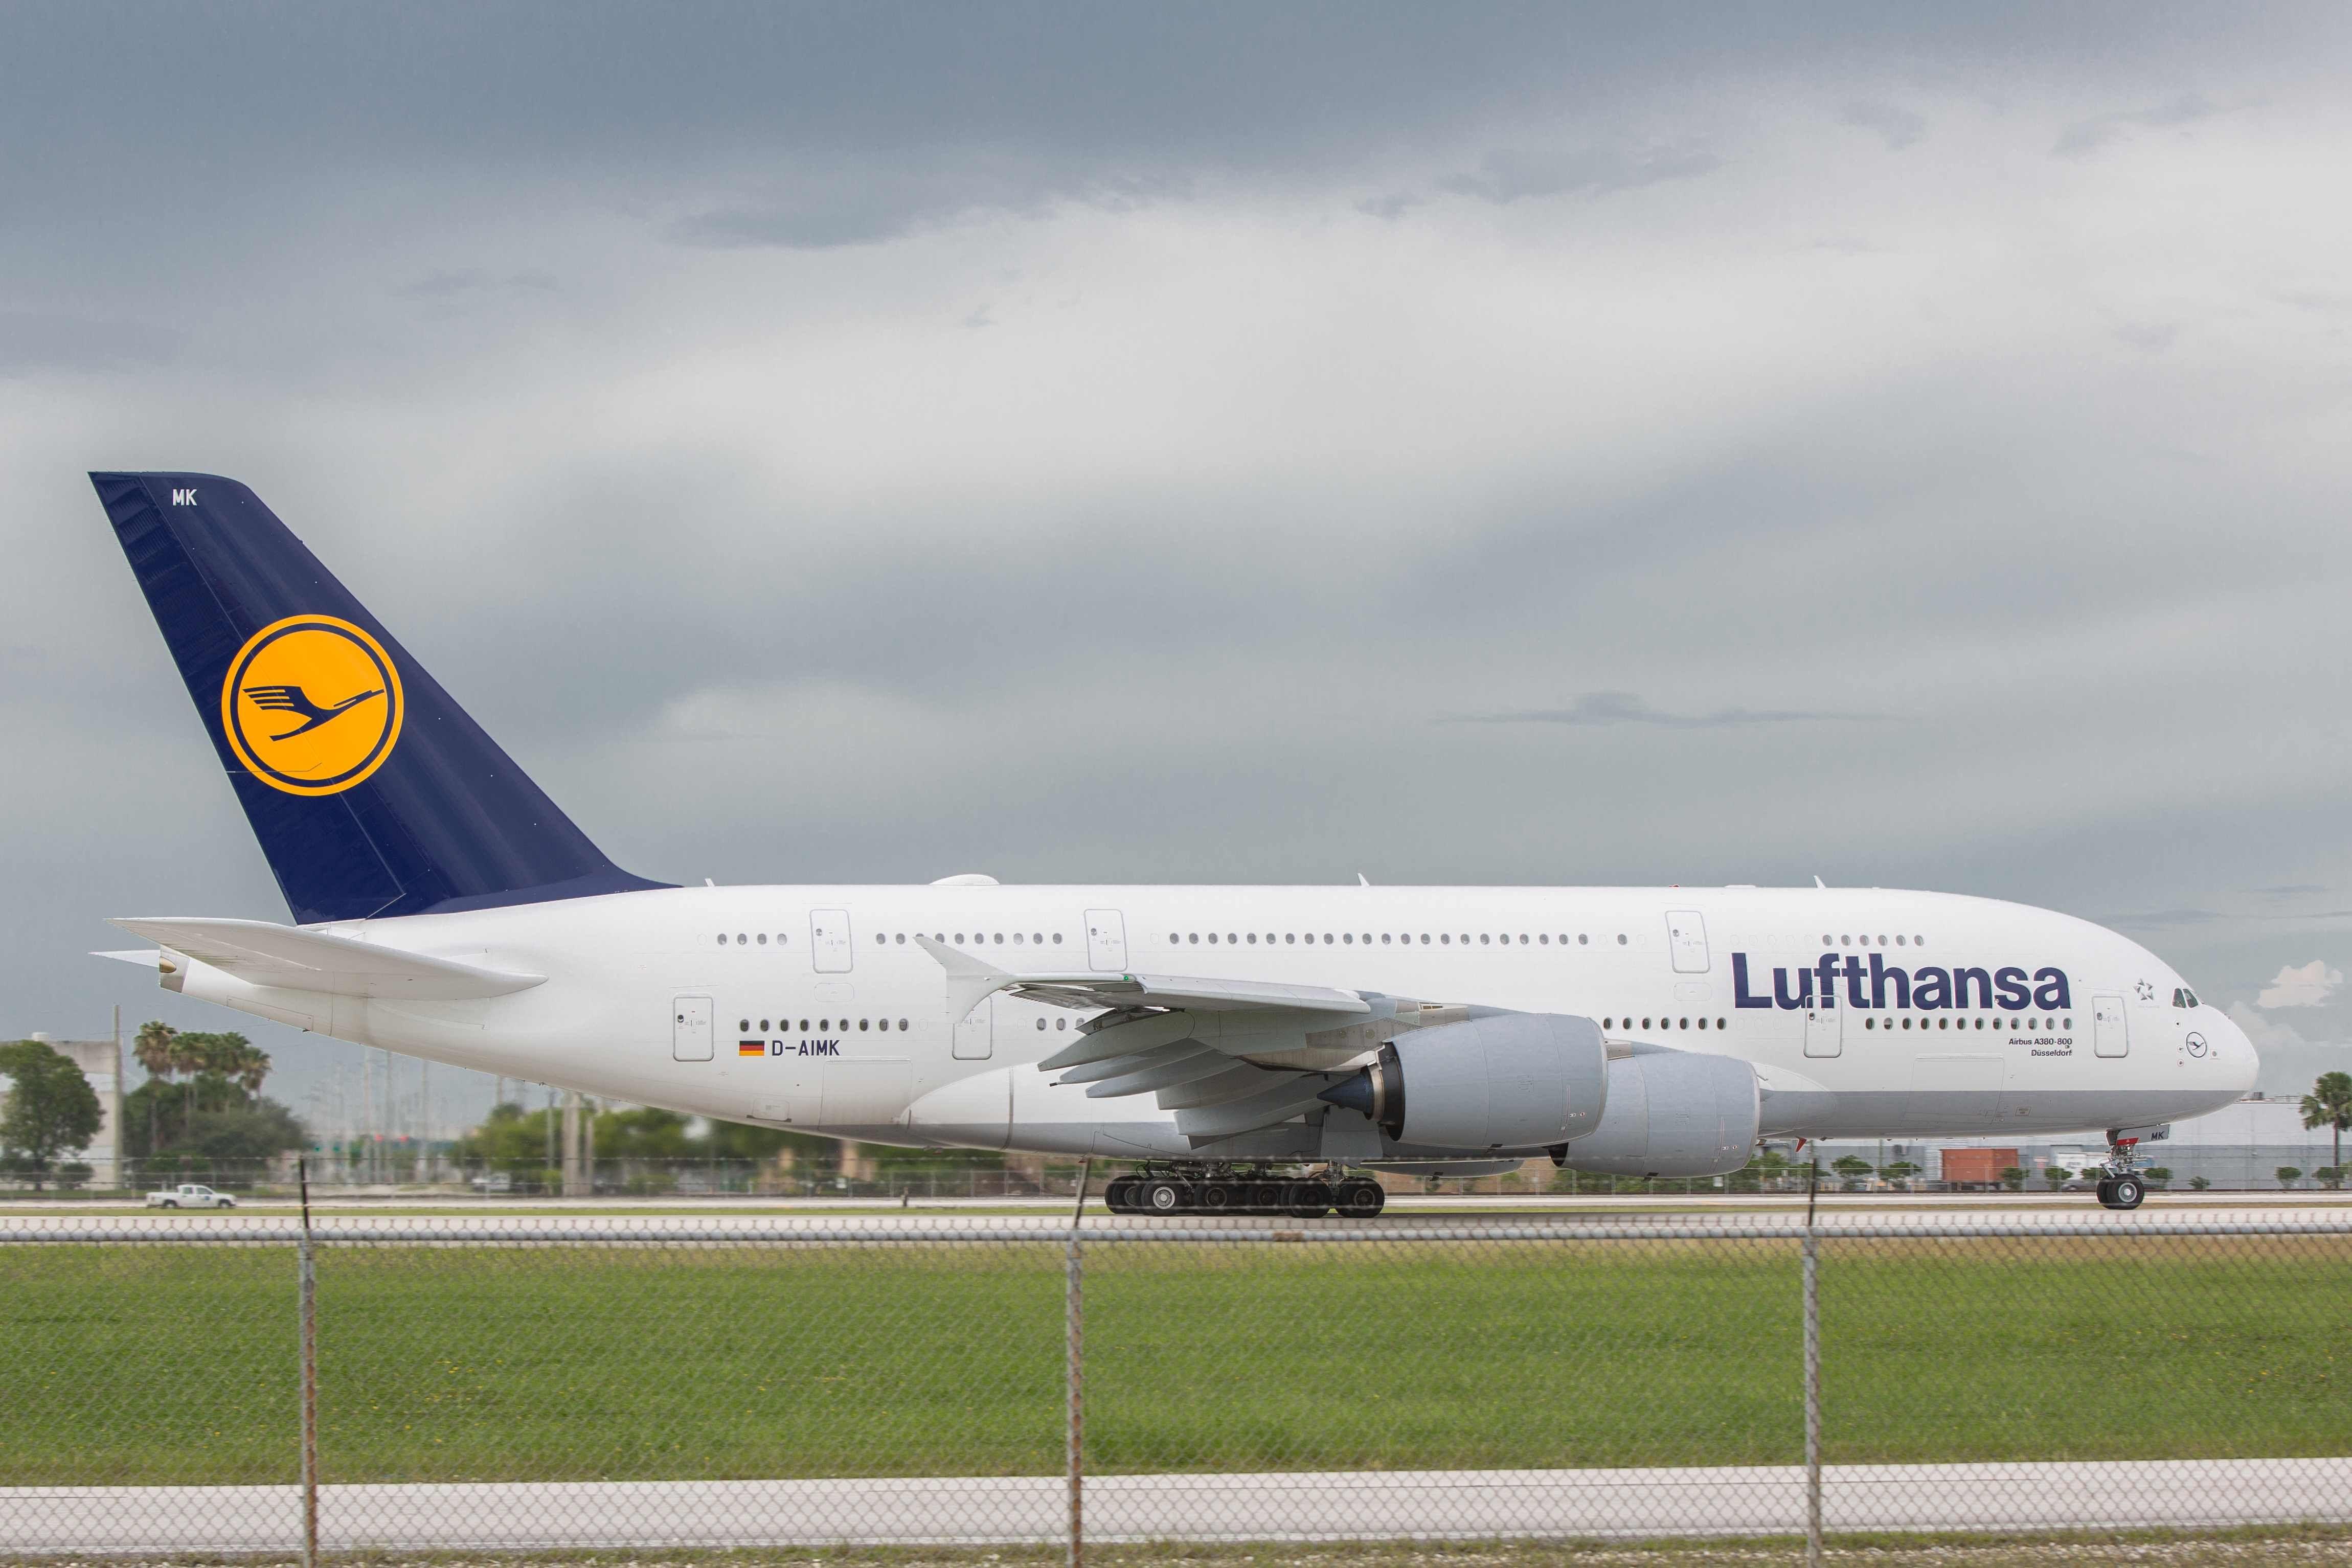 Boeing 747 versus Airbus A380 Airbus A380 vs Boeing 747 LH Flieger